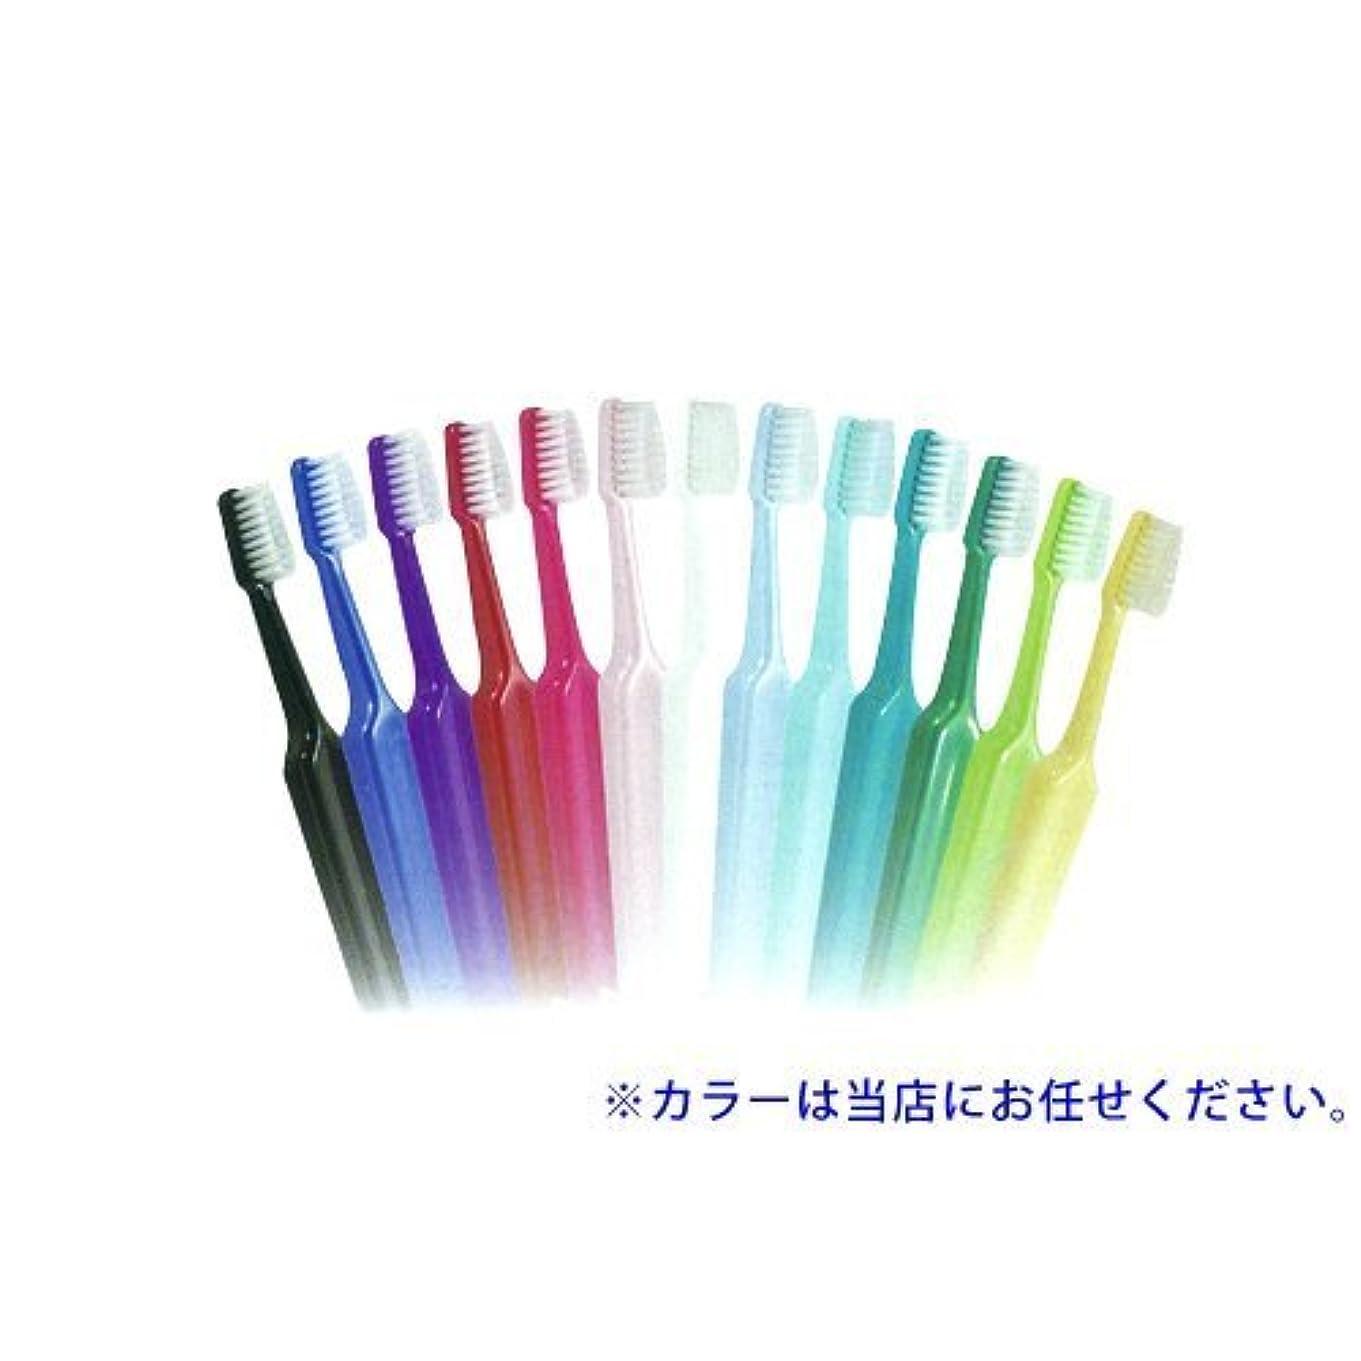 Tepe歯ブラシ セレクトミニ/ソフト 25本/箱